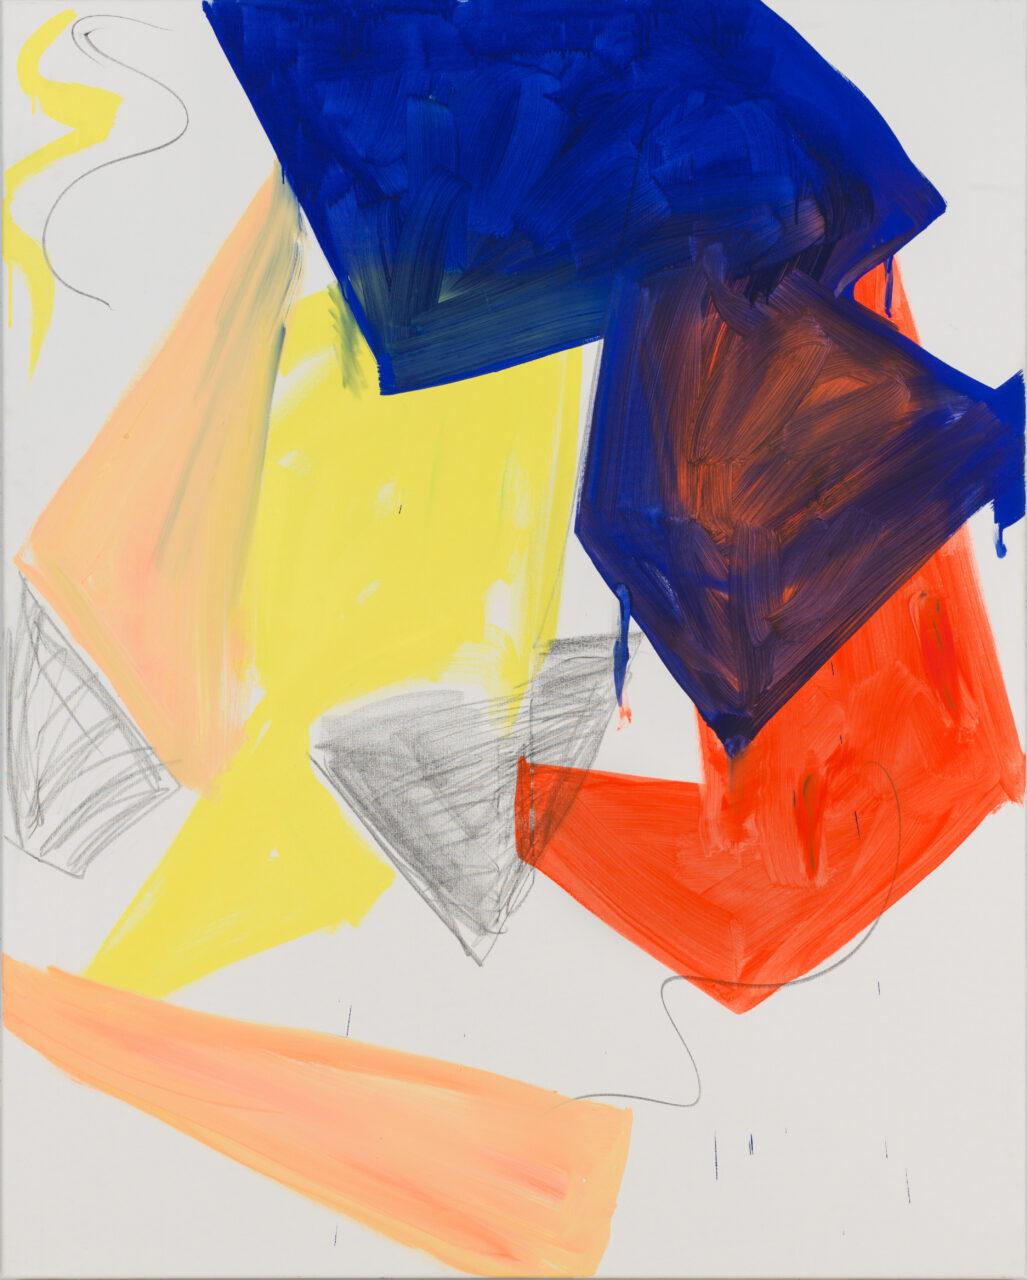 Crazy Shapes | Daniela Trixl | available artwork